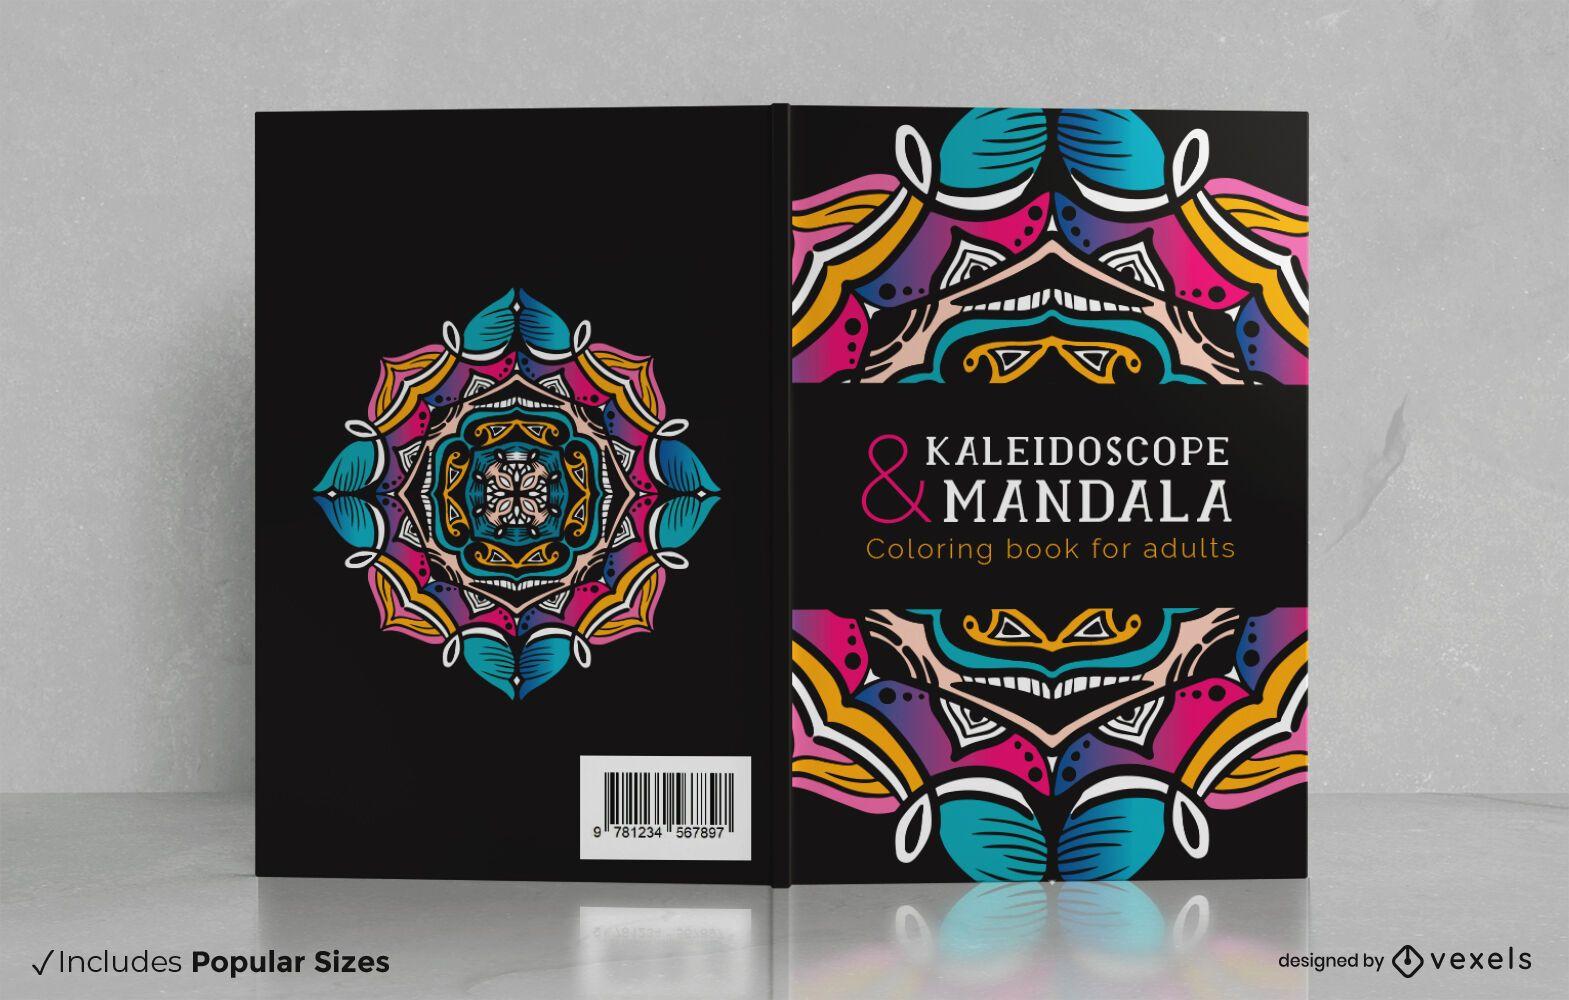 Mandala coloring adults book cover design